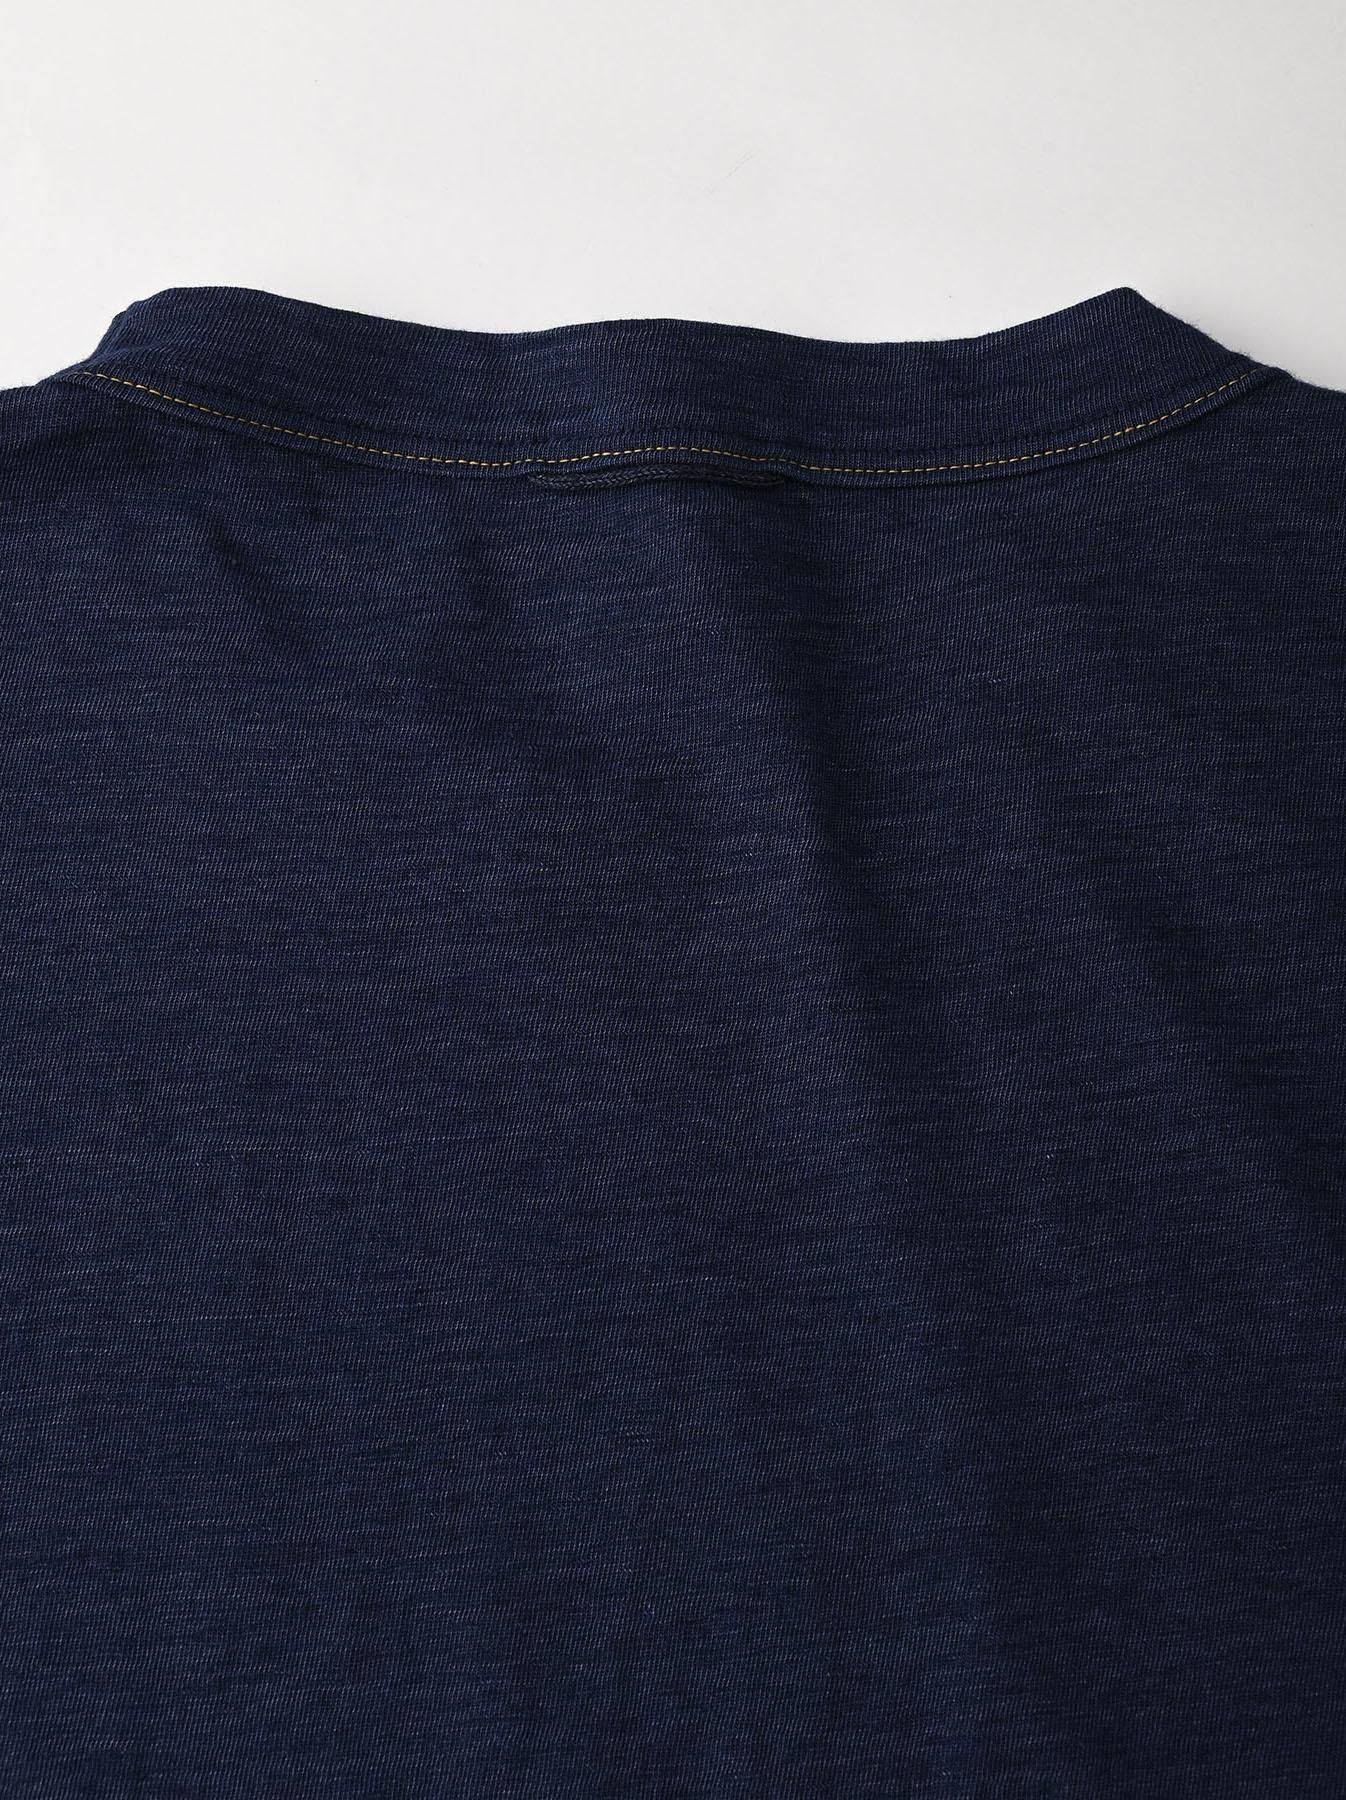 Indigo Hayama-kun Embroidered 908 Ocean T-shirt (0621)-8